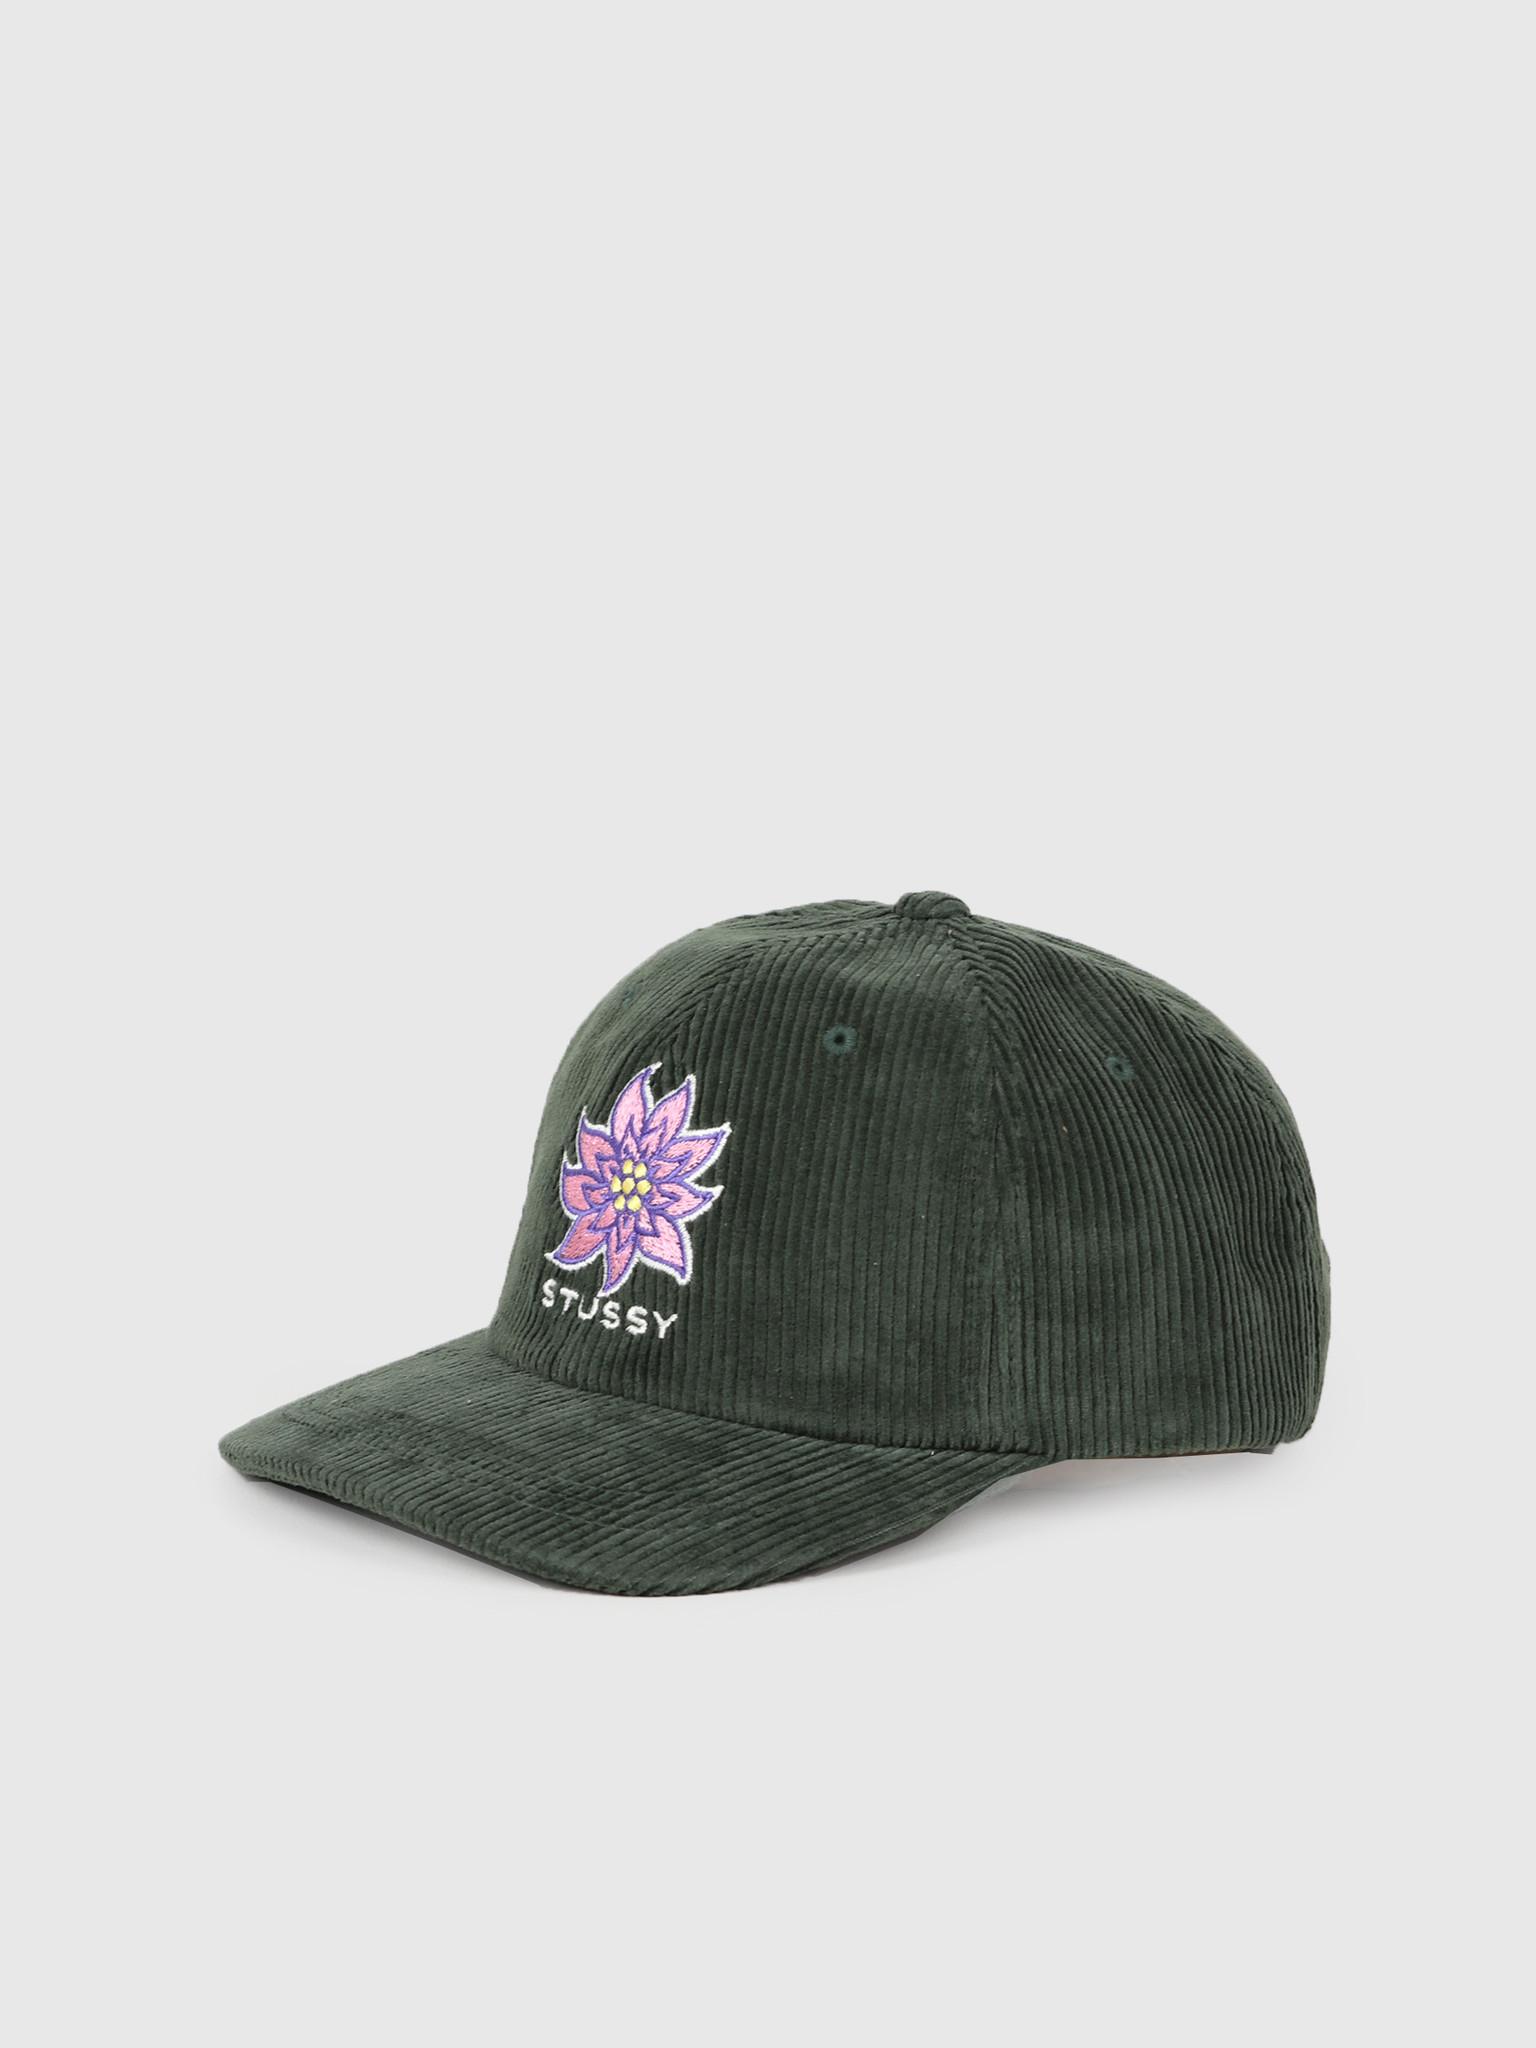 Stussy Stussy Laguna Flower Low Pro Cap Green 131902